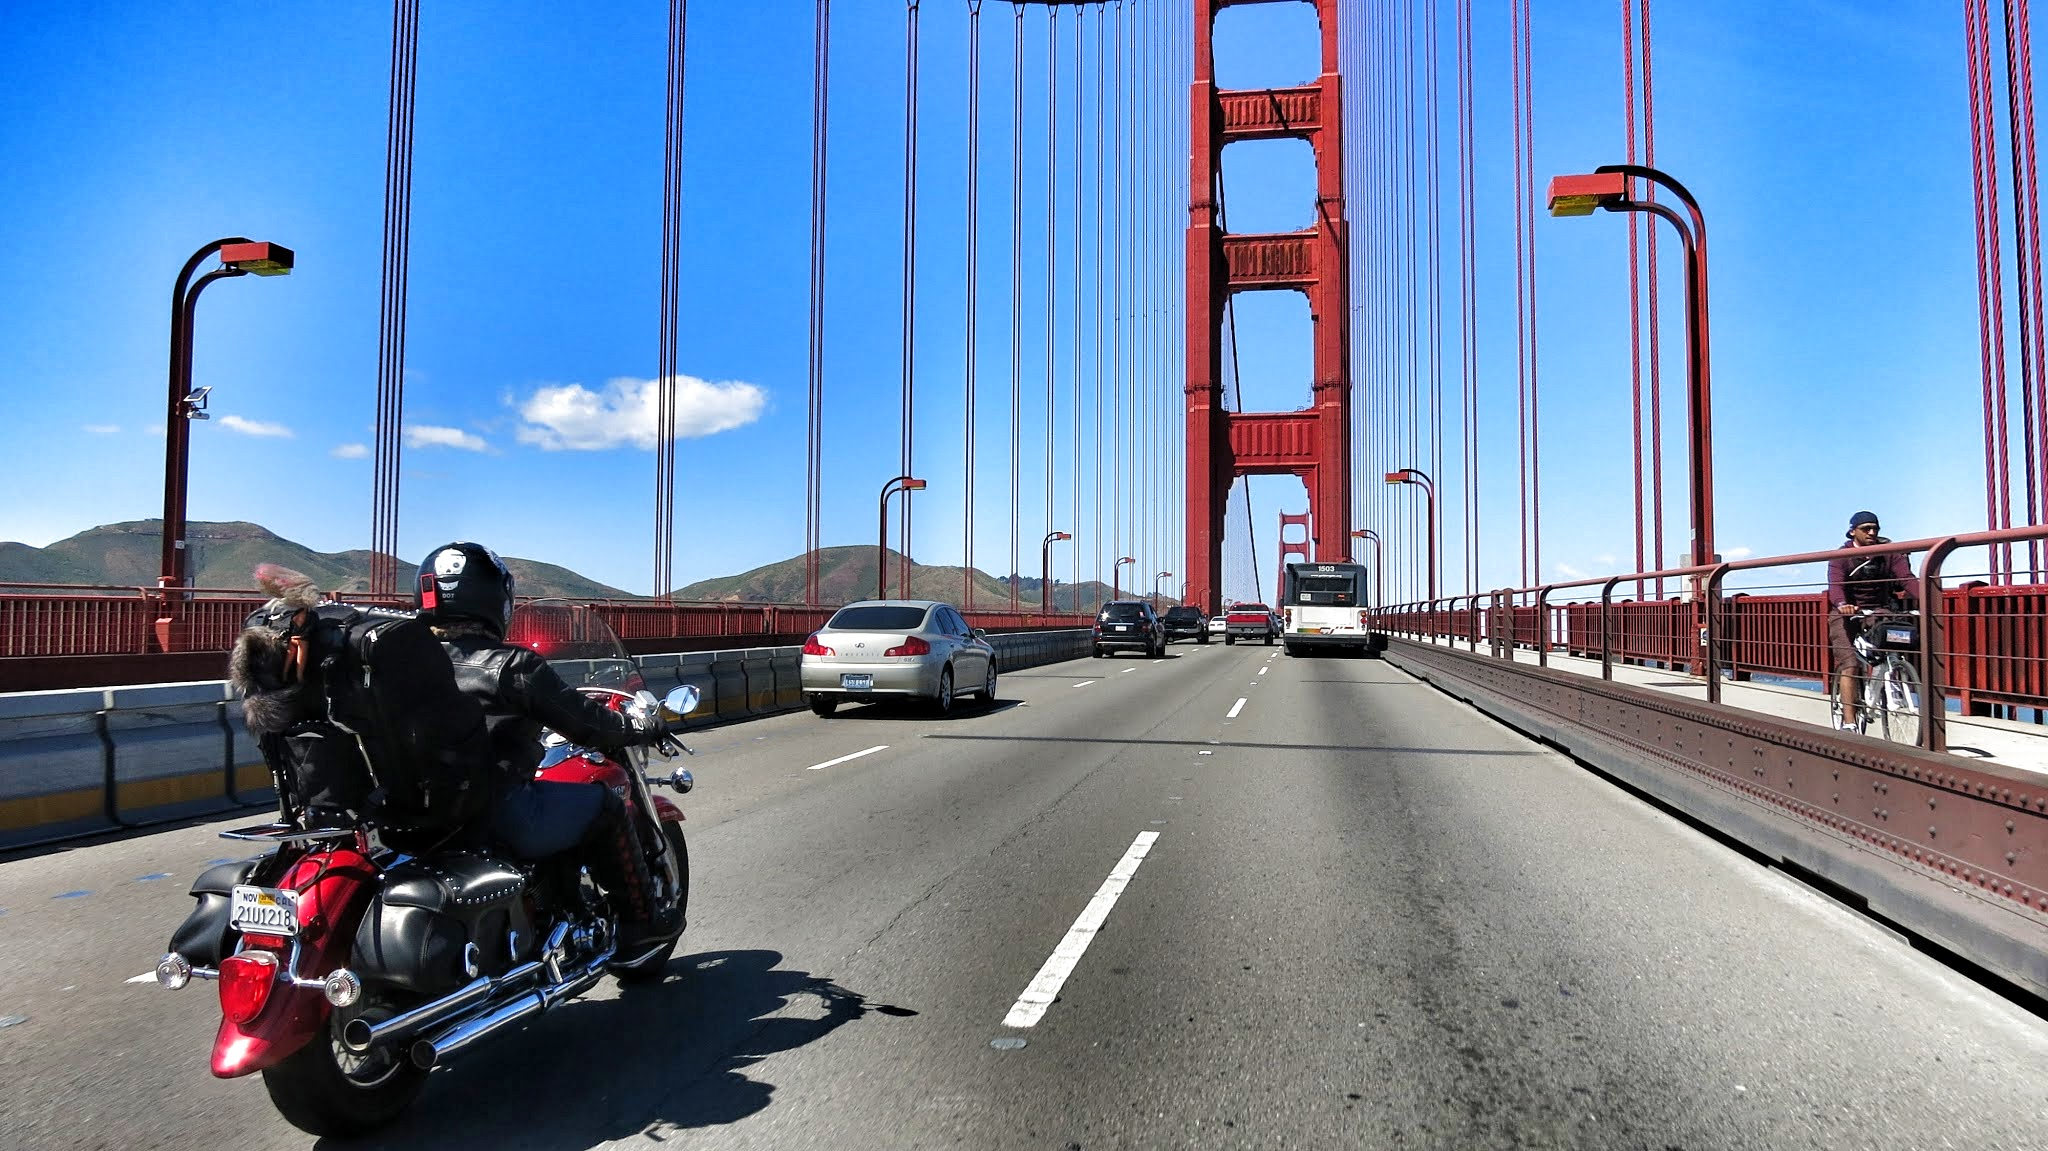 13 Motorcycle Golden Gate Bridge Road Pickle